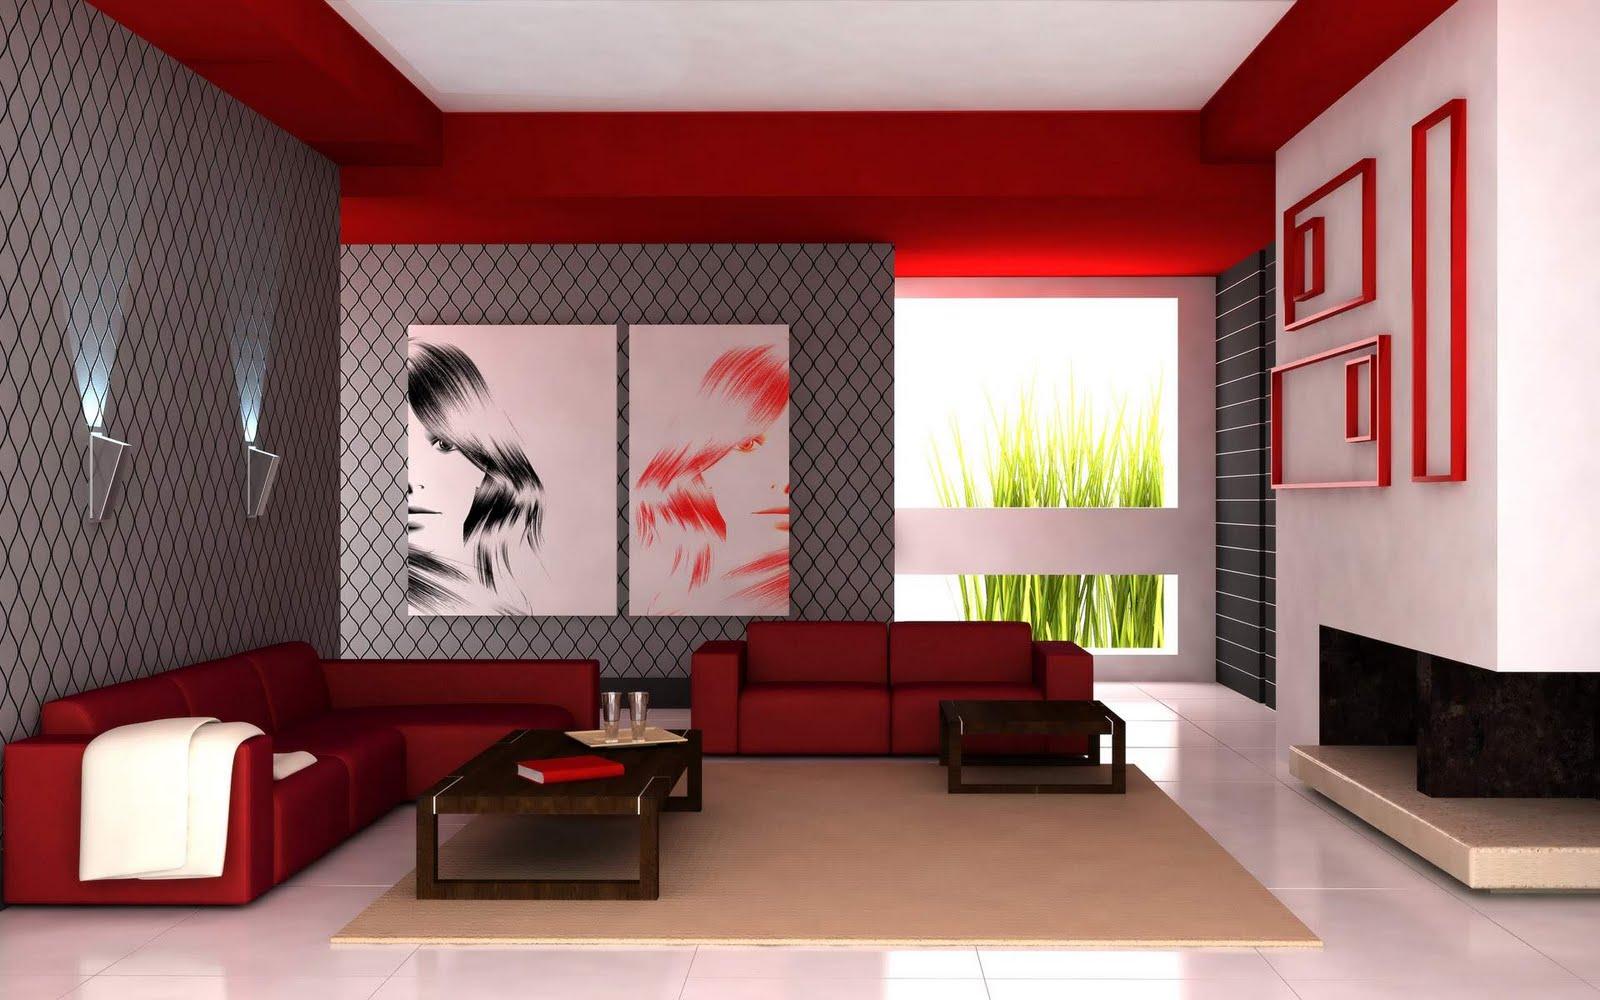 modern-interior-decorating-simple-design-9-on-decor-design-ideas